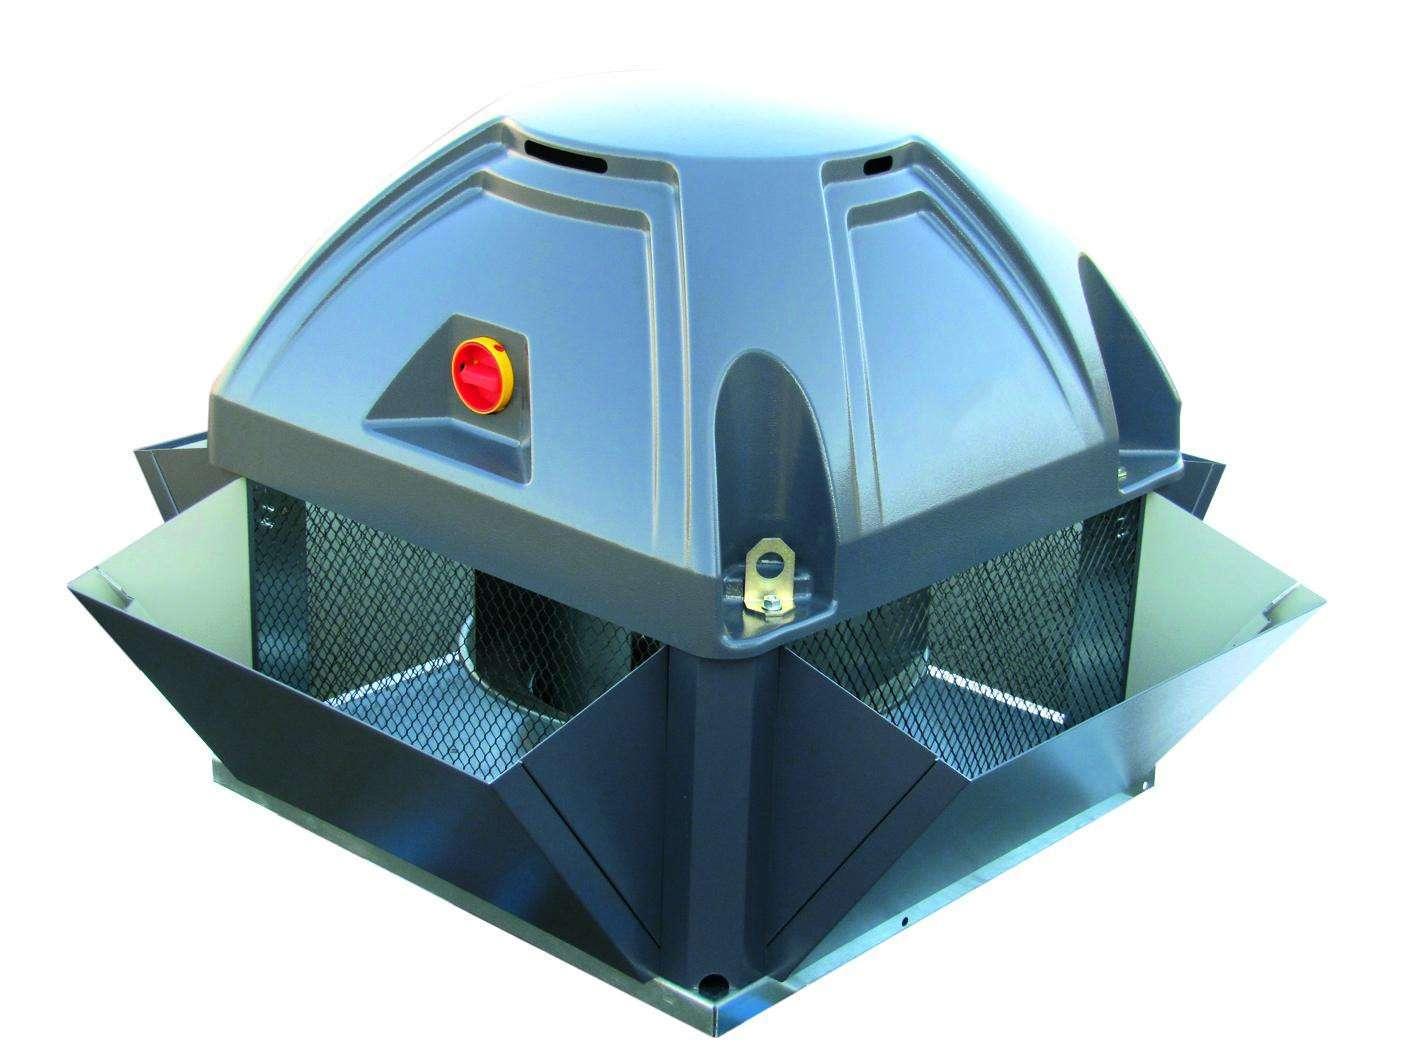 TNVB/4-315 I/IE1 Unelvent S&P Tourelle Centrifuge Rejet Vertical 201283